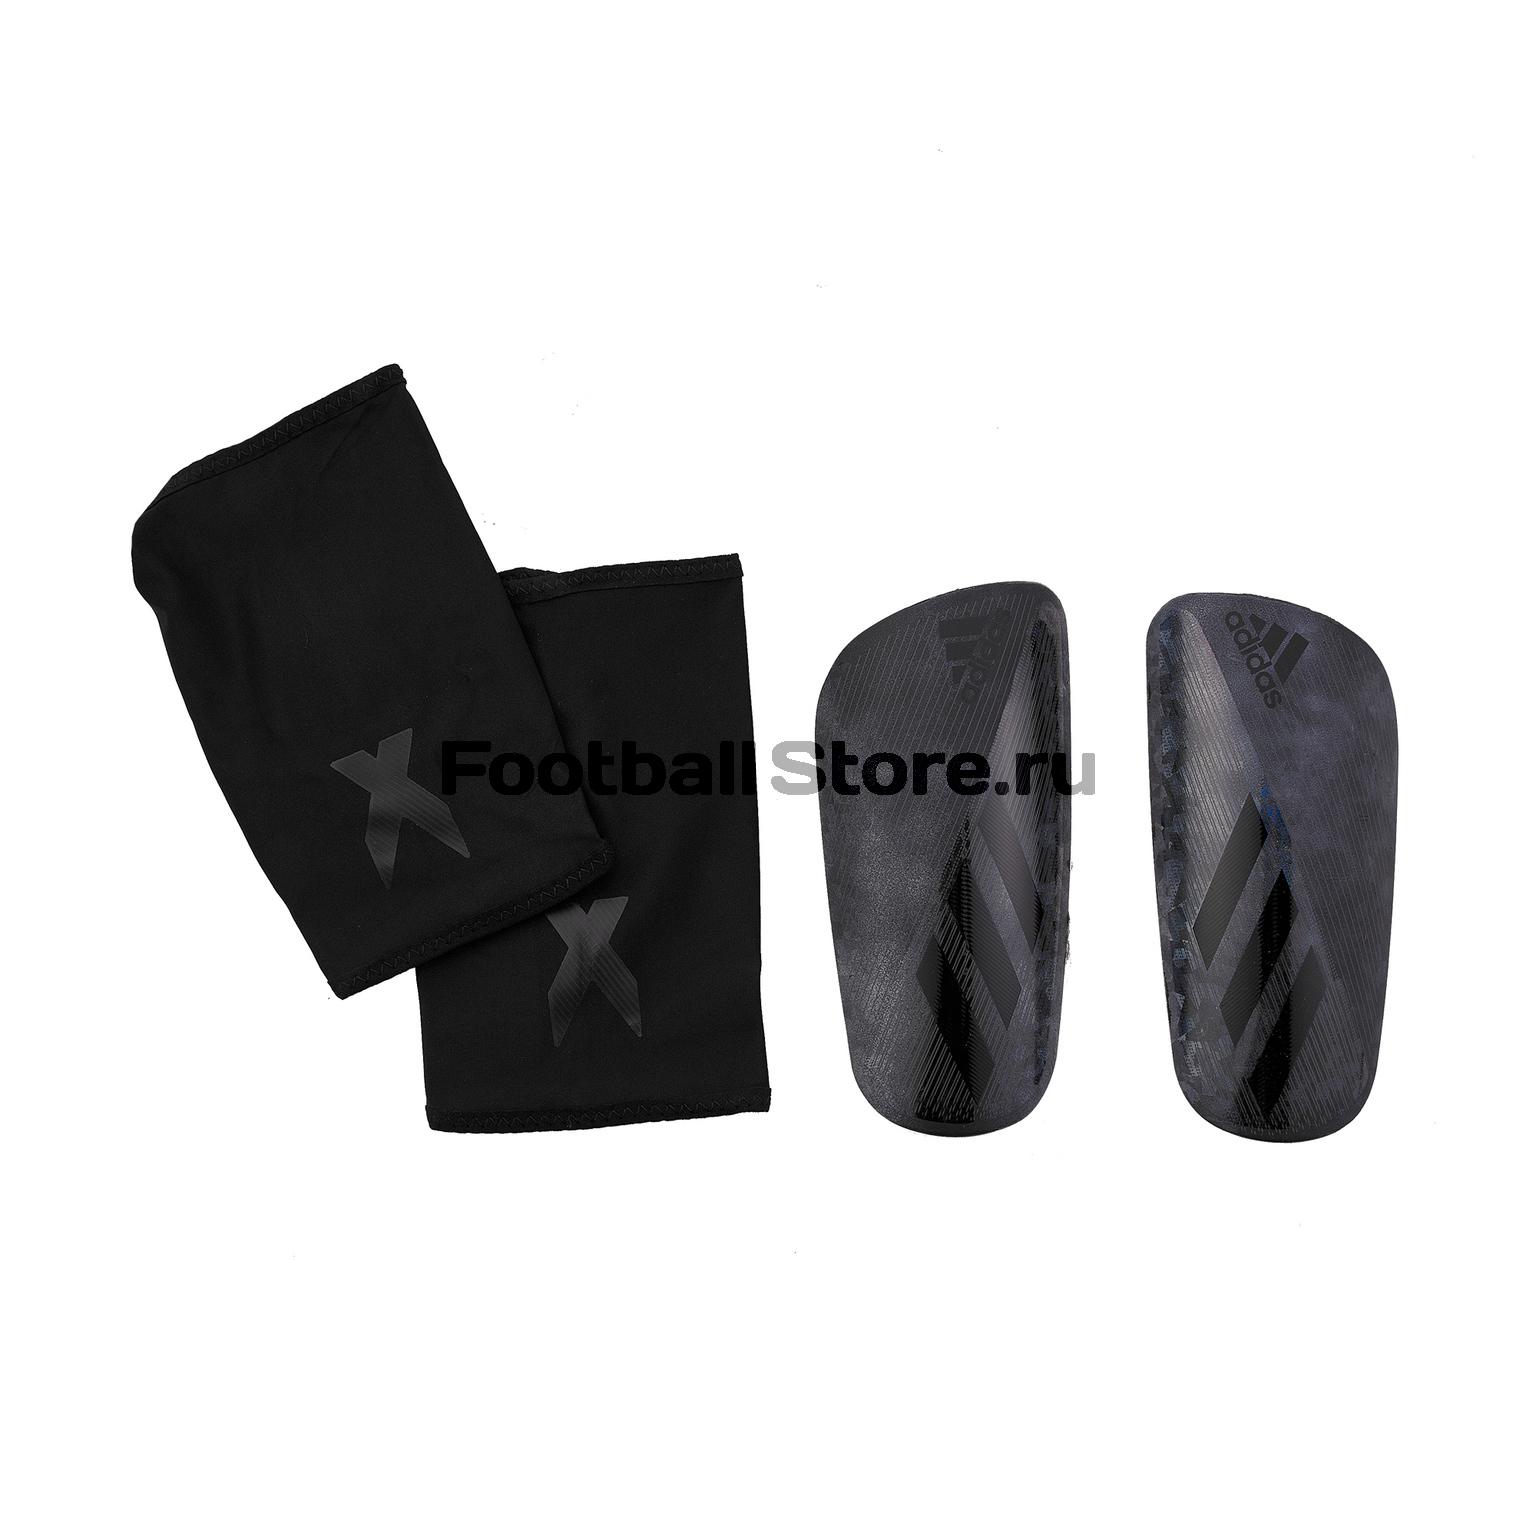 Щитки Adidas X Pro DY0076